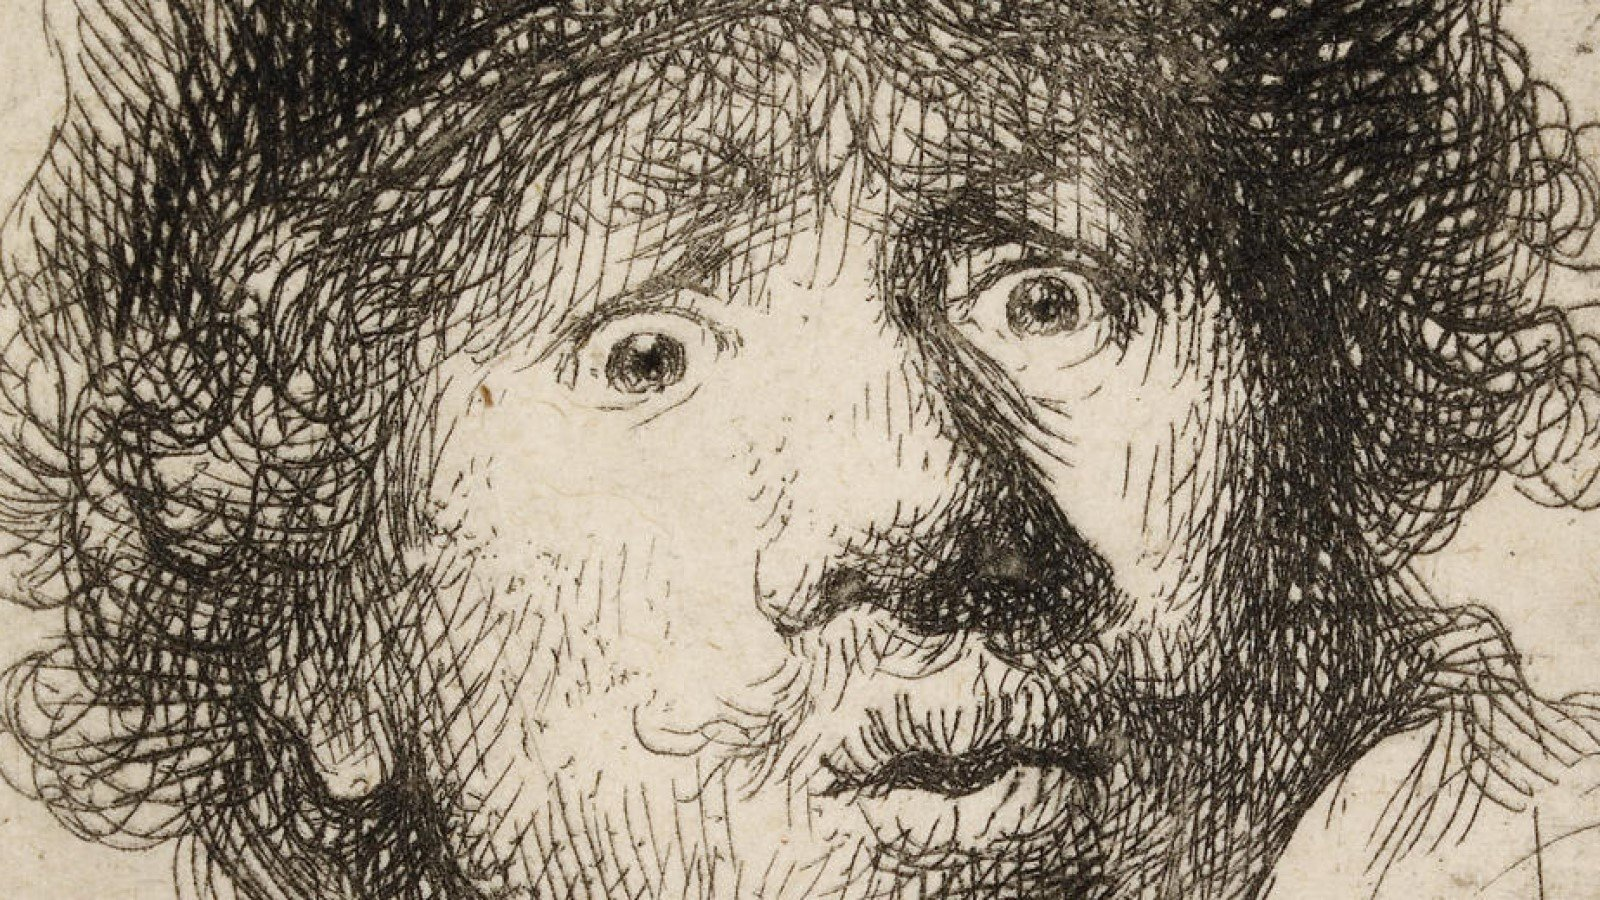 Young Rembrandt at the Ashmolean - Rembrandt Self-portrait in a Fur Cap Bust